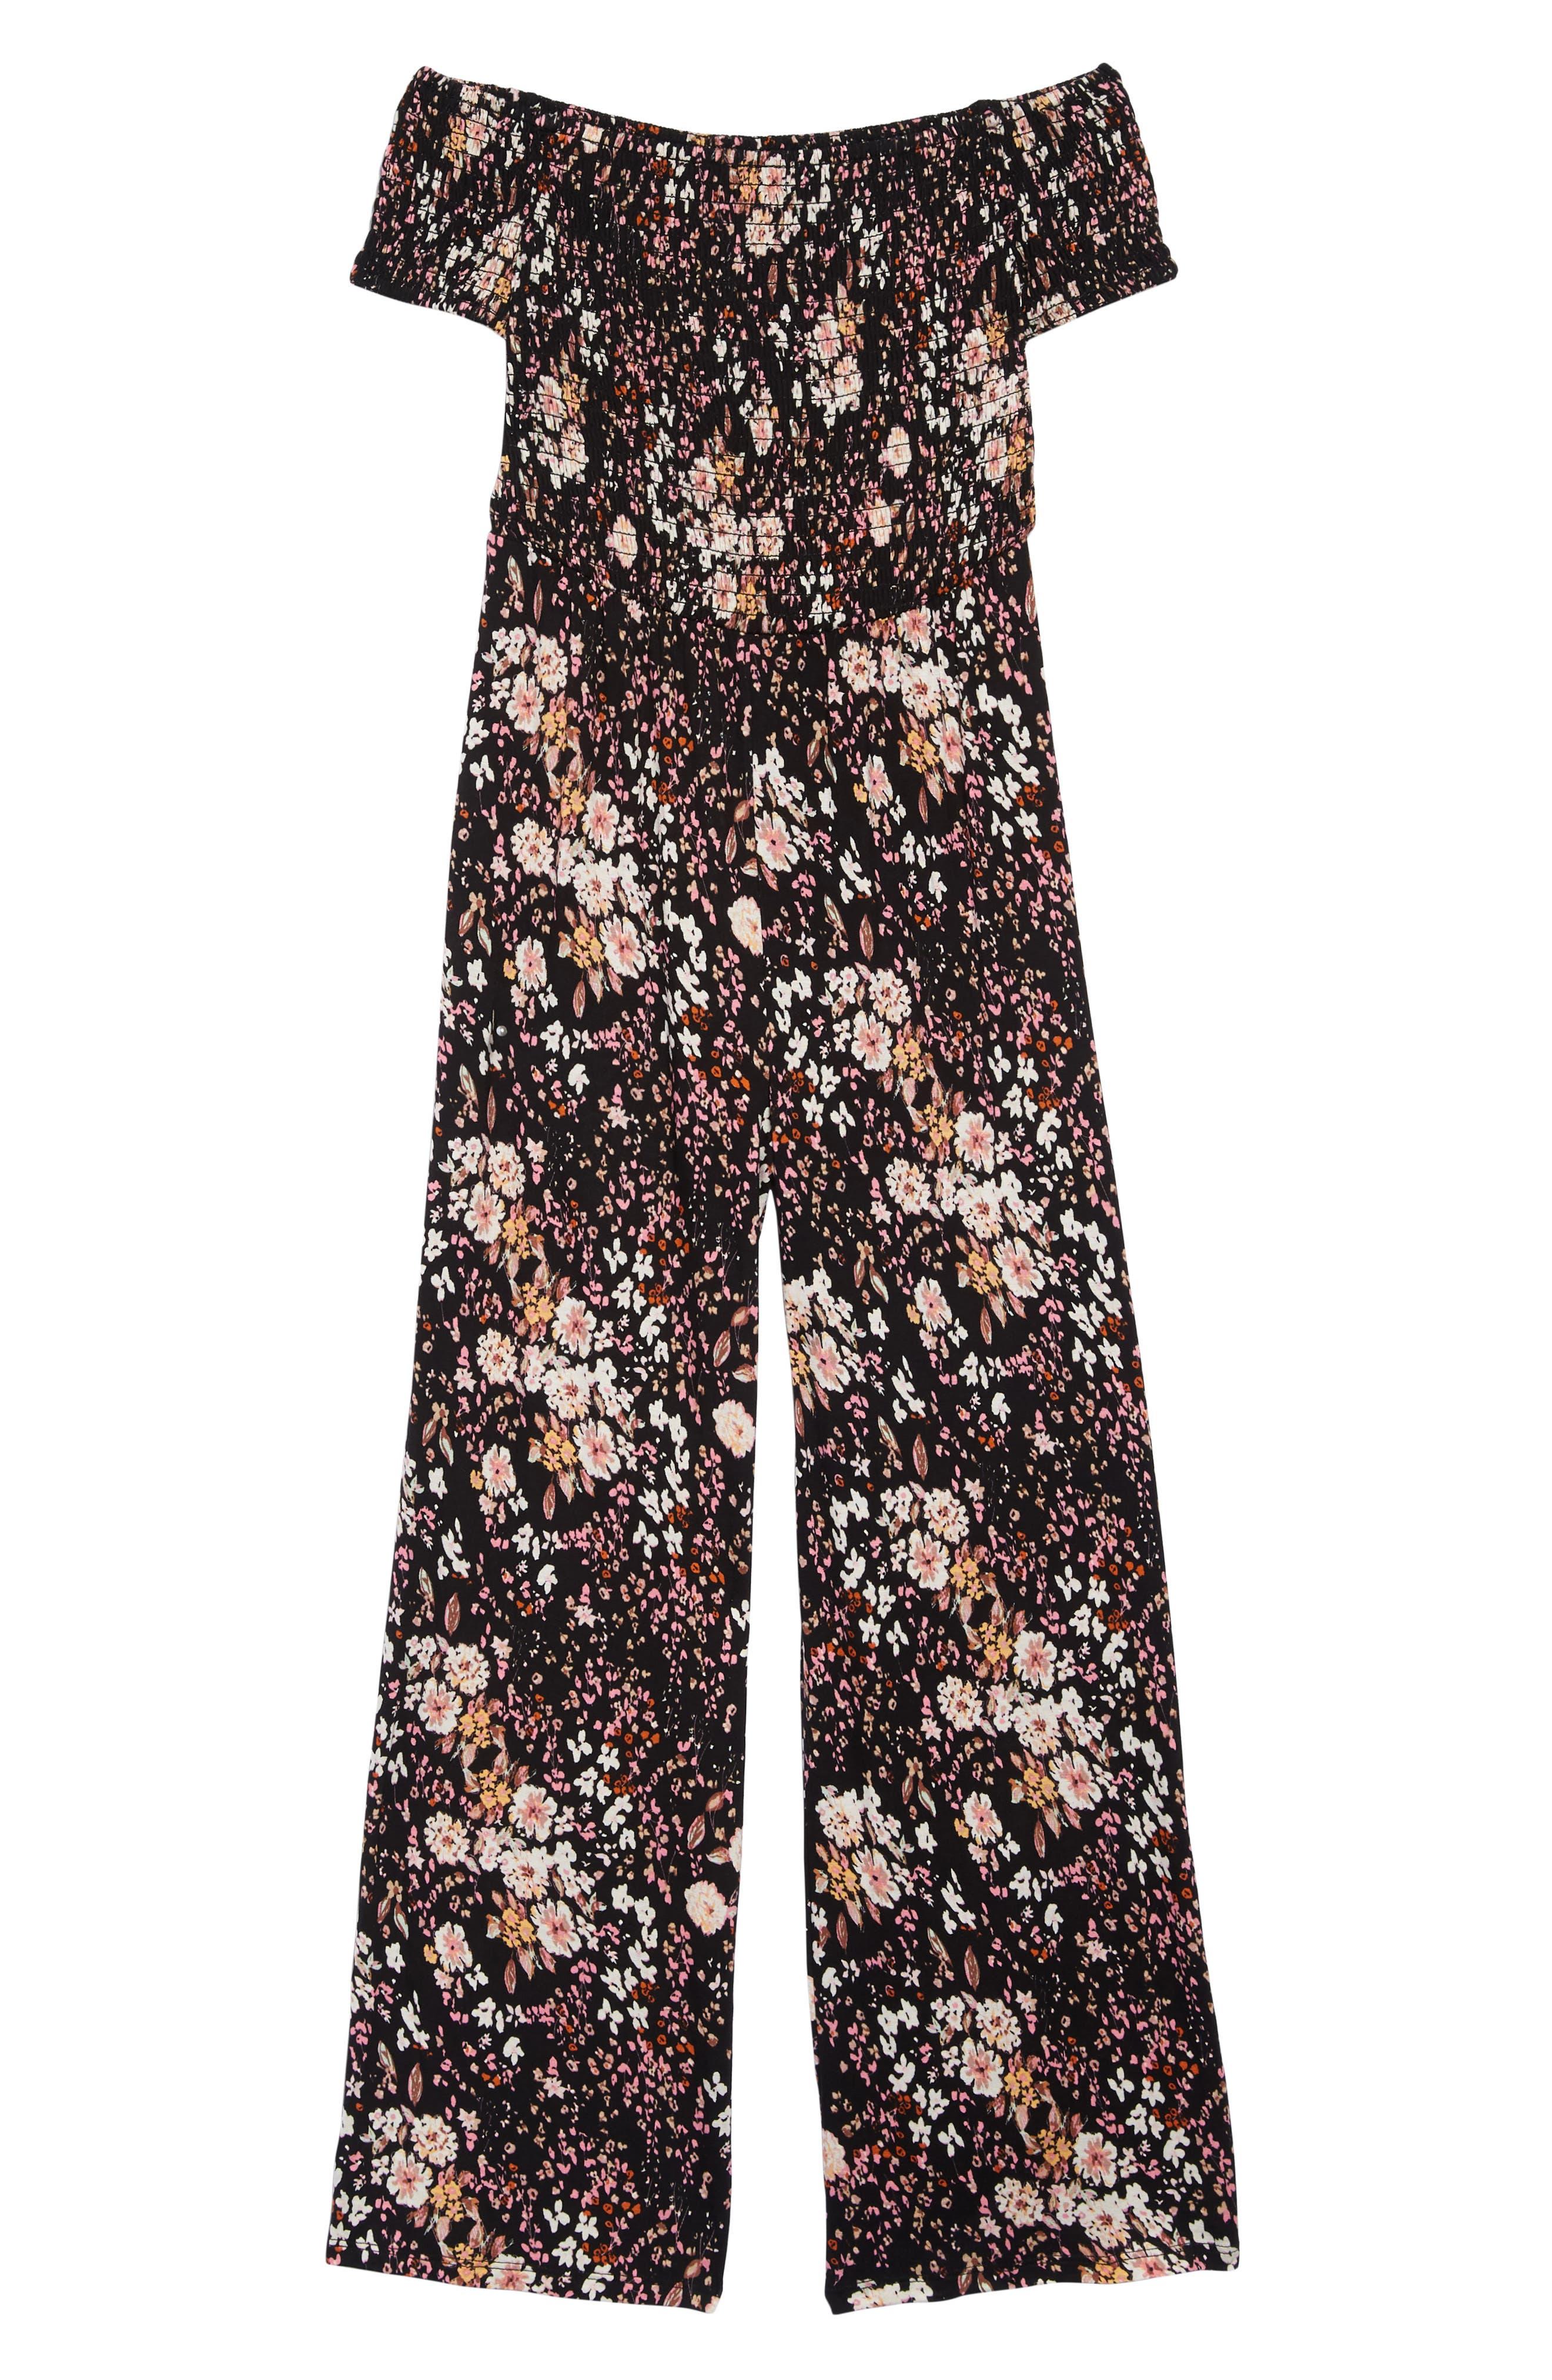 Girls Love Fire Off The Shoulder Knit Jumpsuit Size XL (16)  Black